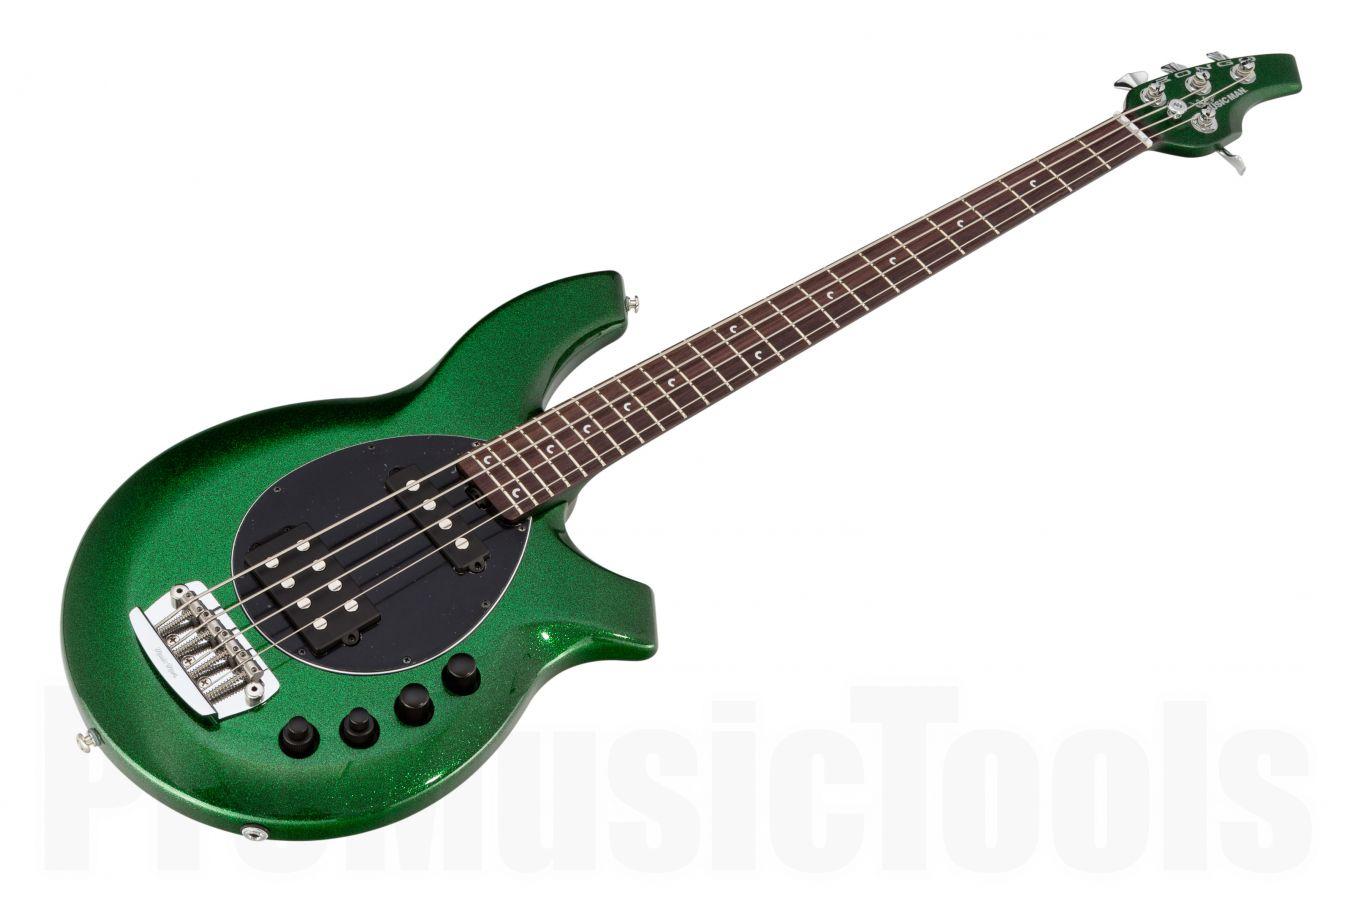 Music Man USA Bongo 4 HS ES - PDN Emerald Green Sparkle Limited Edition